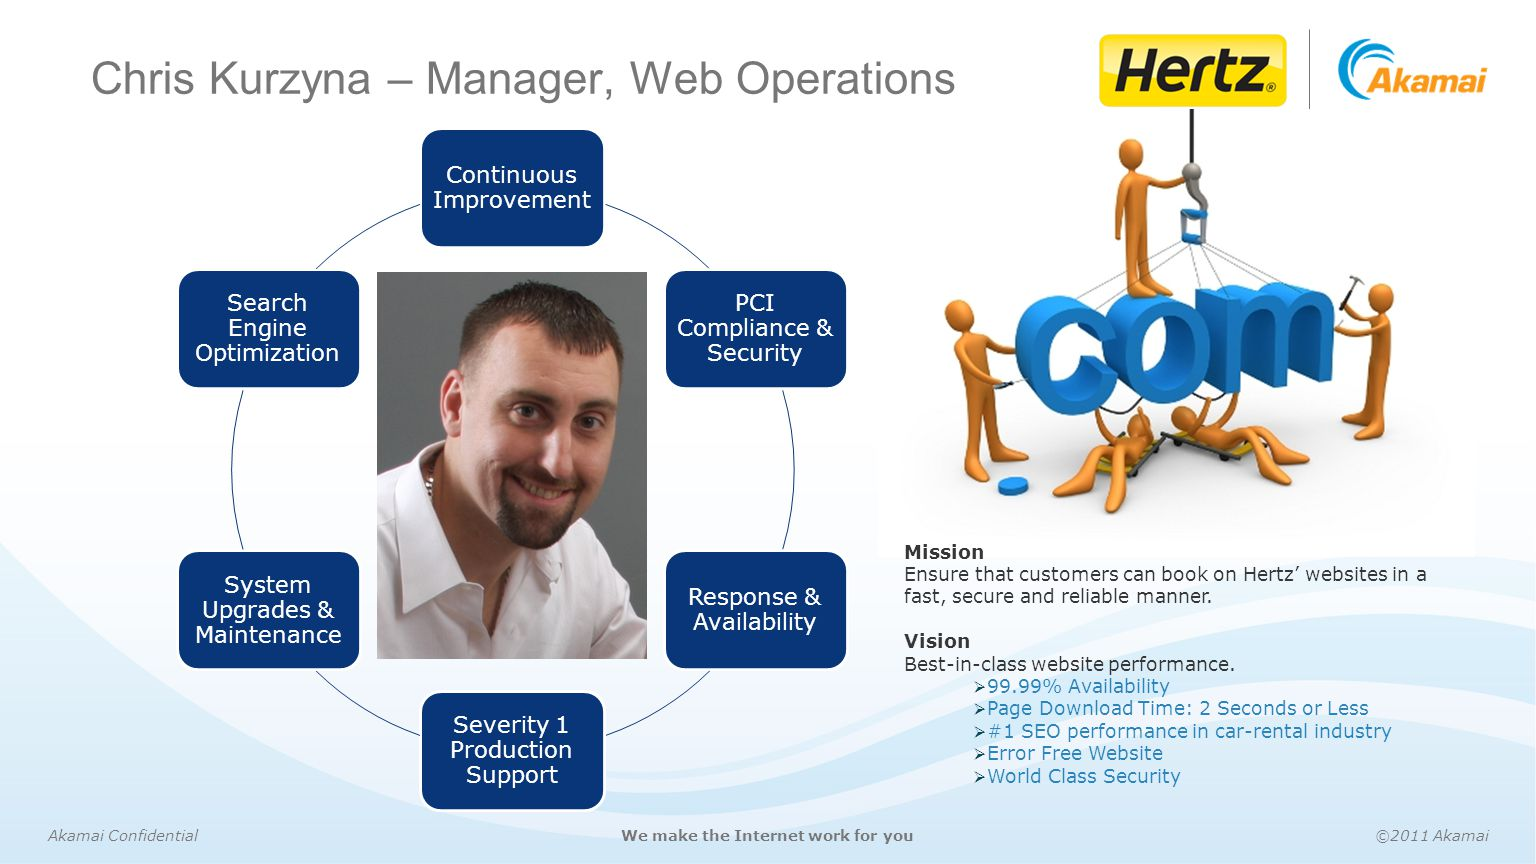 Chris Kurzyna – Manager, Web Operations